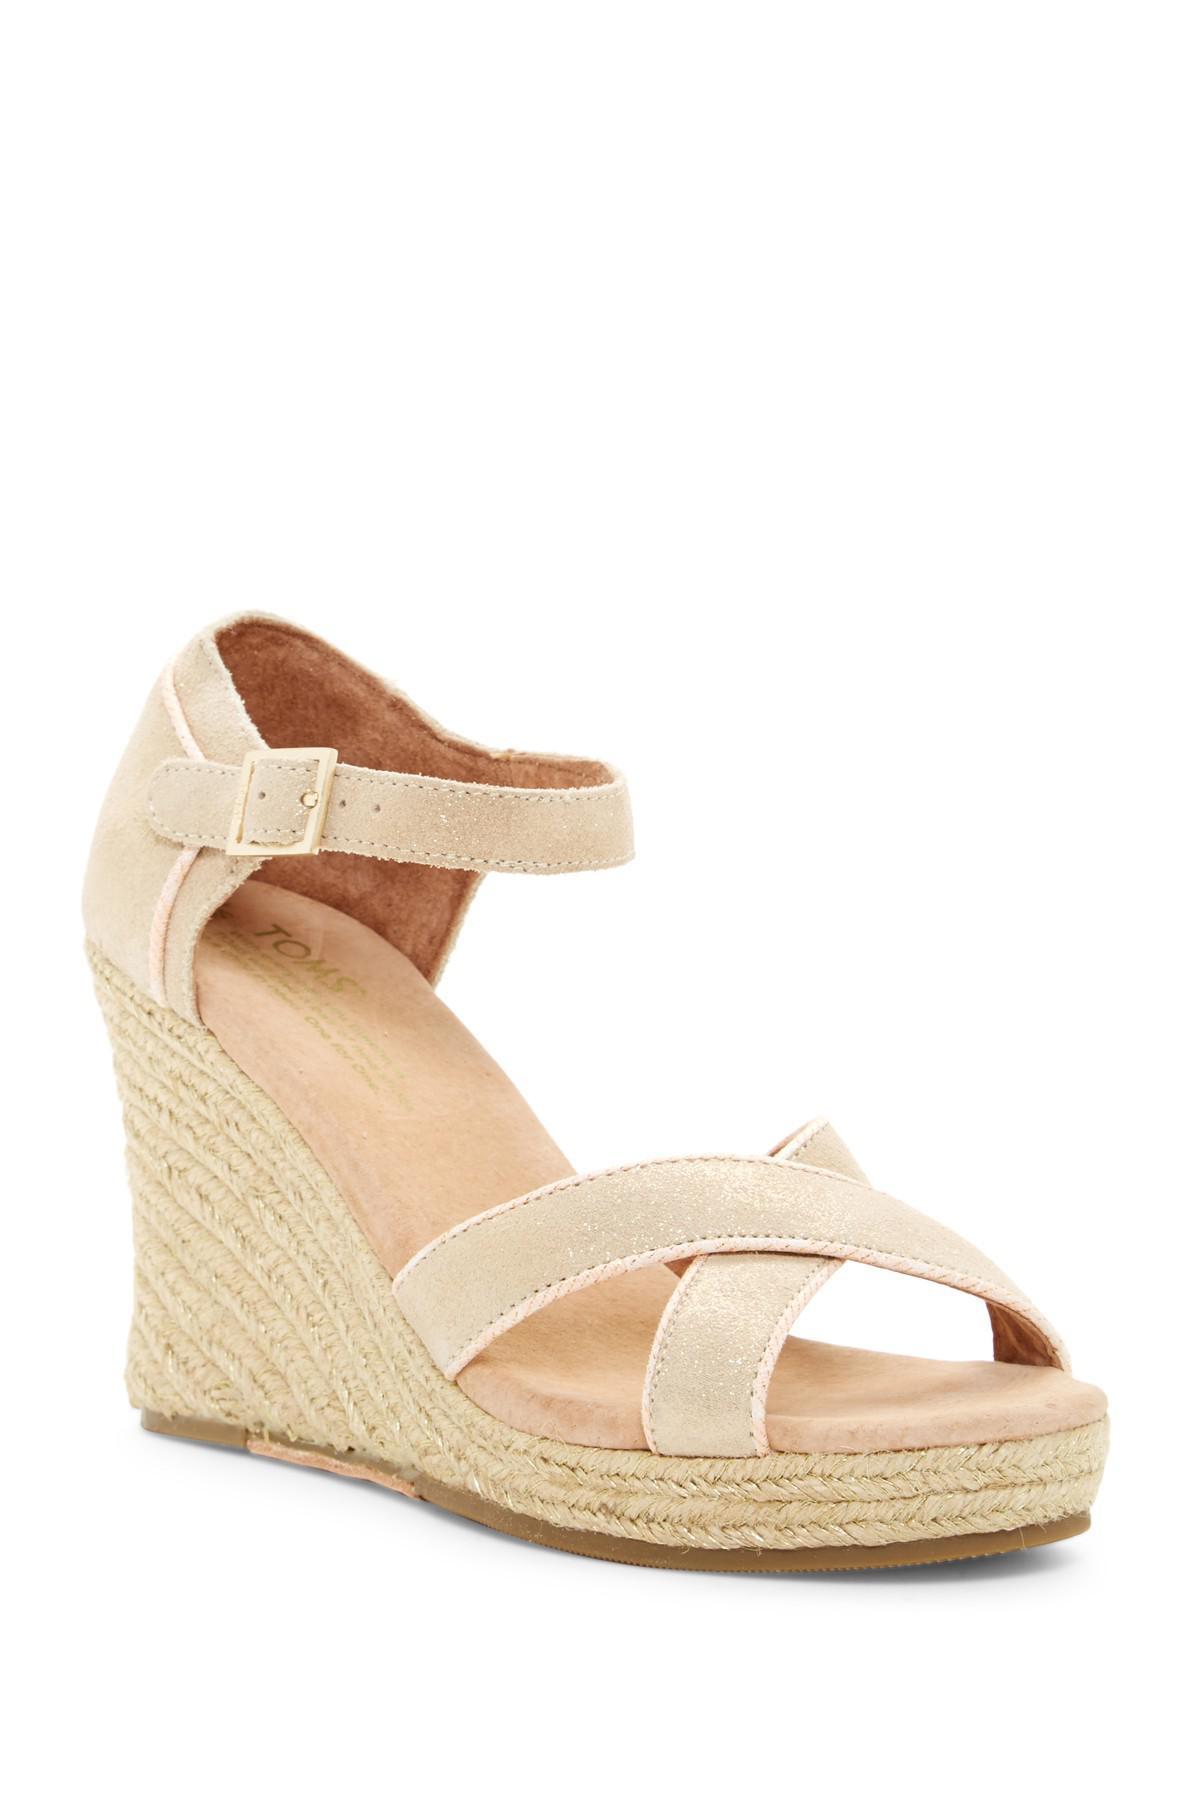 faf15f34598 Lyst - TOMS Metallic Suede Wedge Espadrille Wedding Sandal in Natural